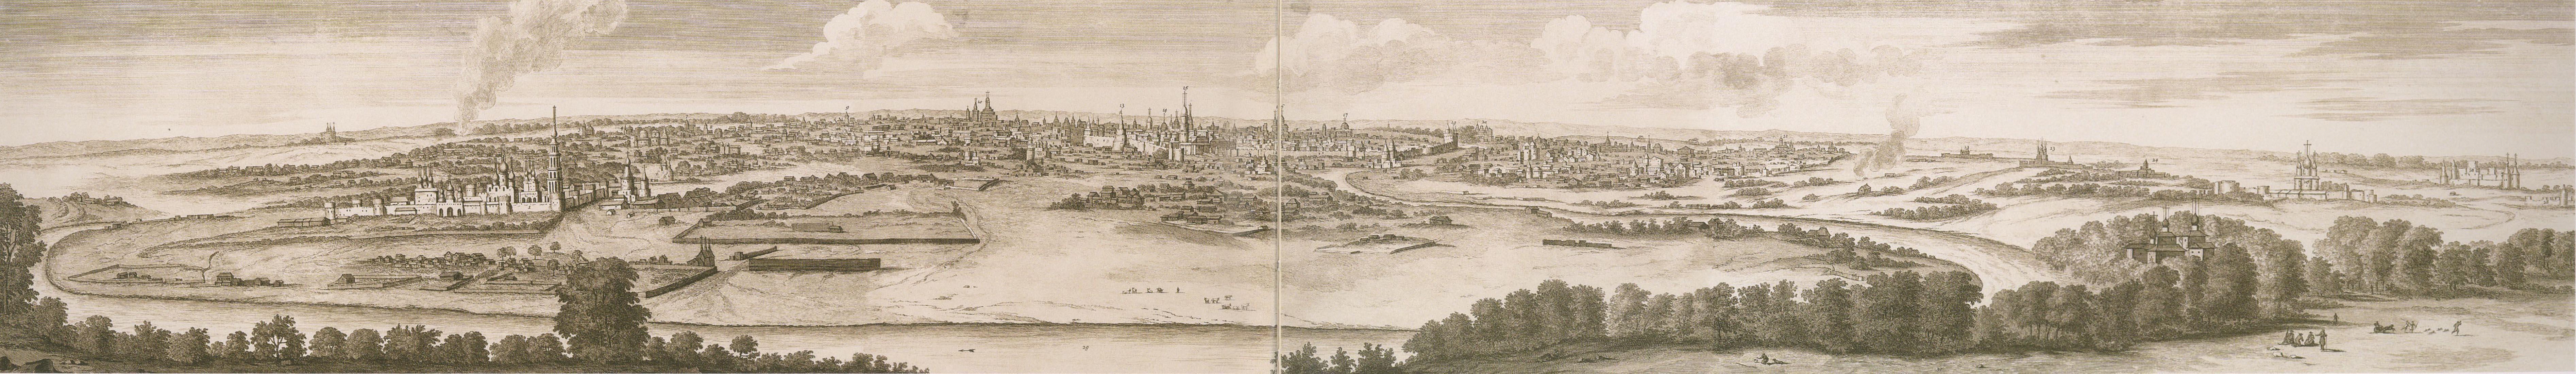 452015 Вид Москвы с Воробьёвых гор 1702 Корнелиус де Бруин.jpg